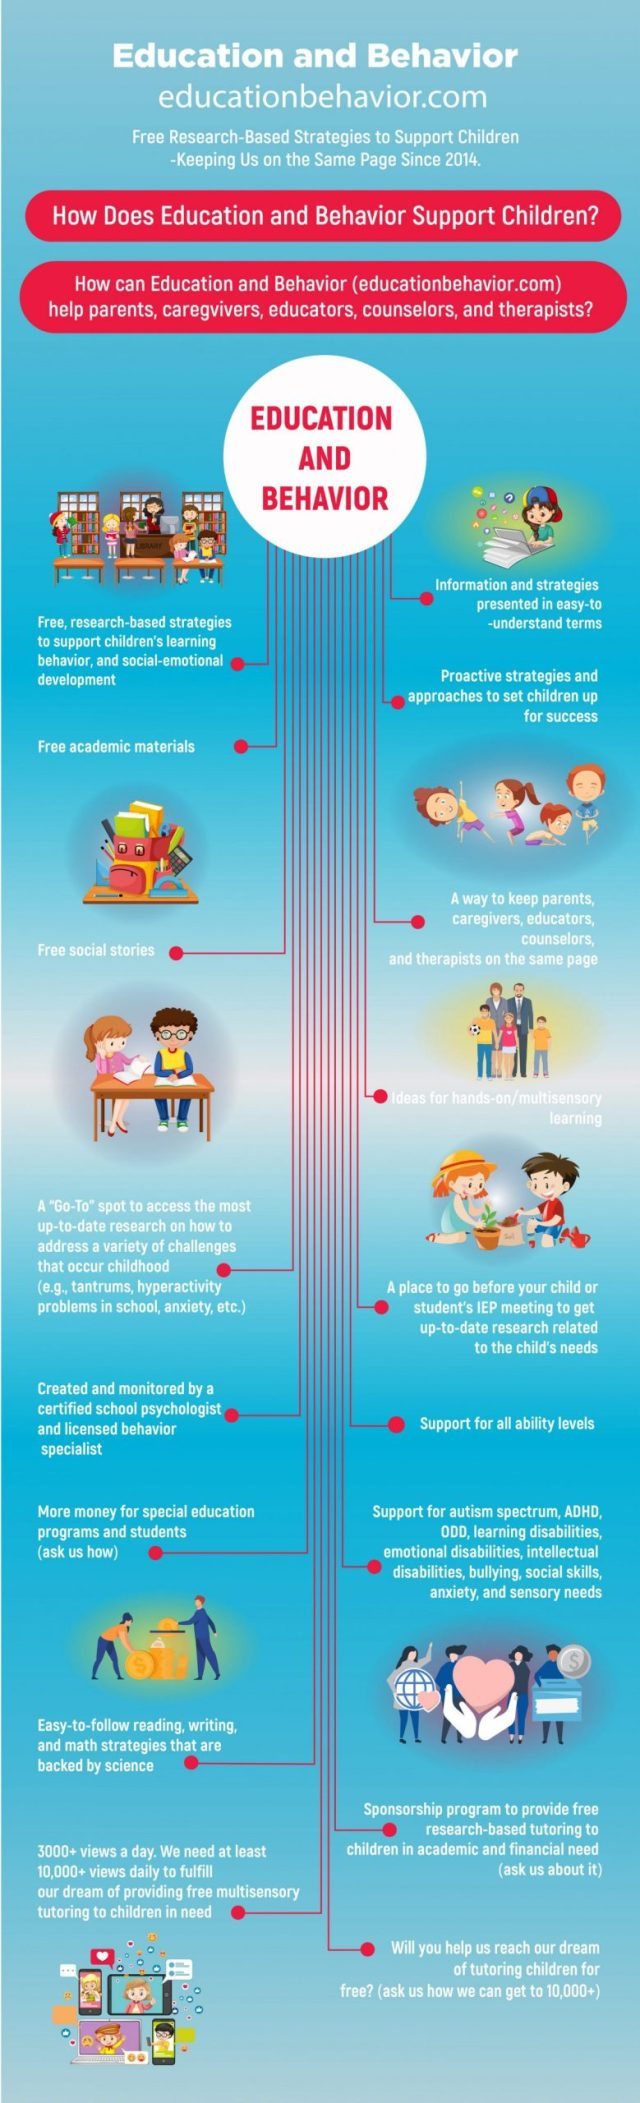 Education and Behavior